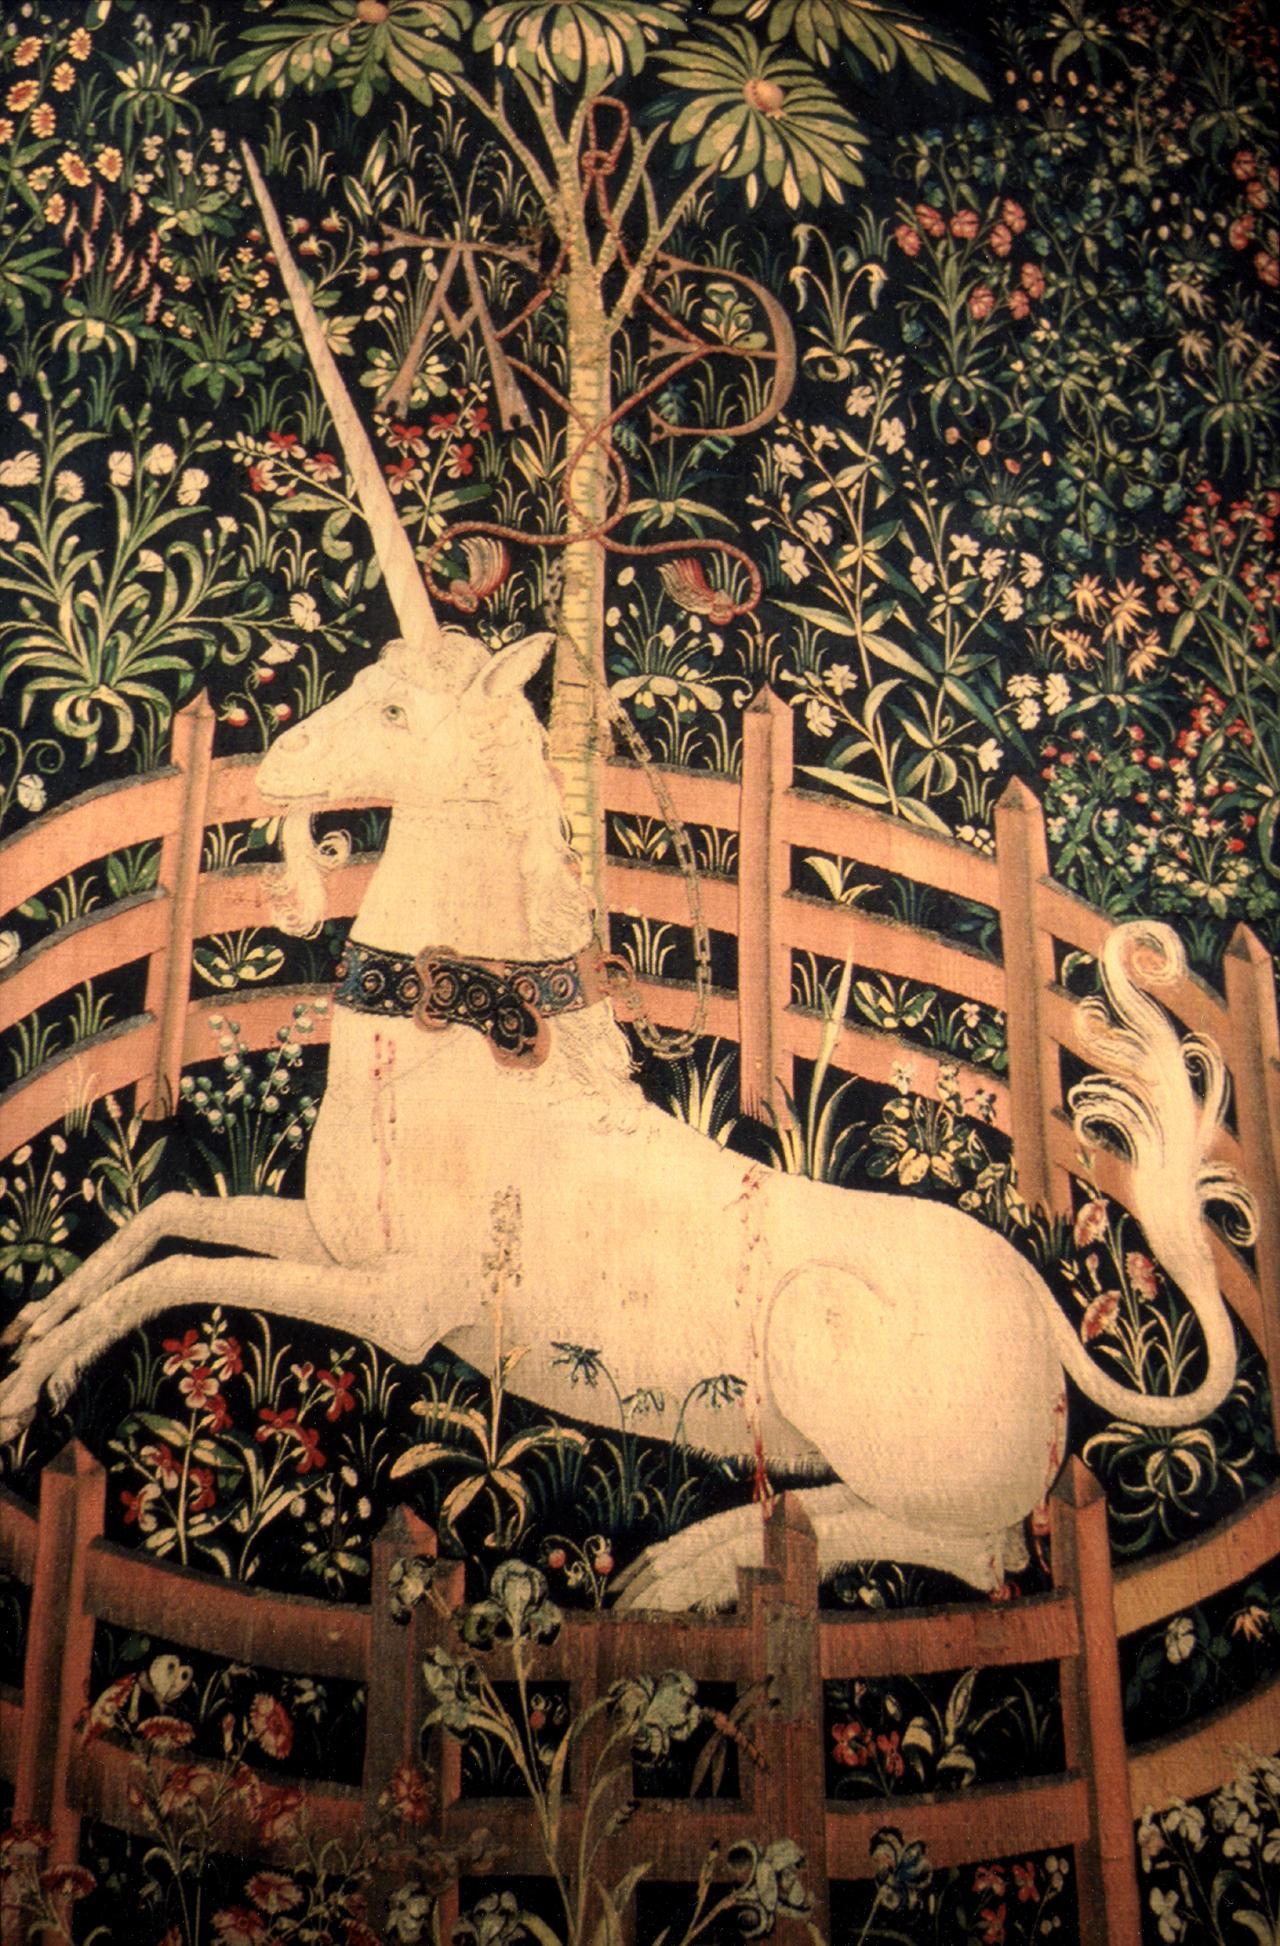 [Image: cloisters_unicorn_tapestry_by_chibiphantom.jpg]